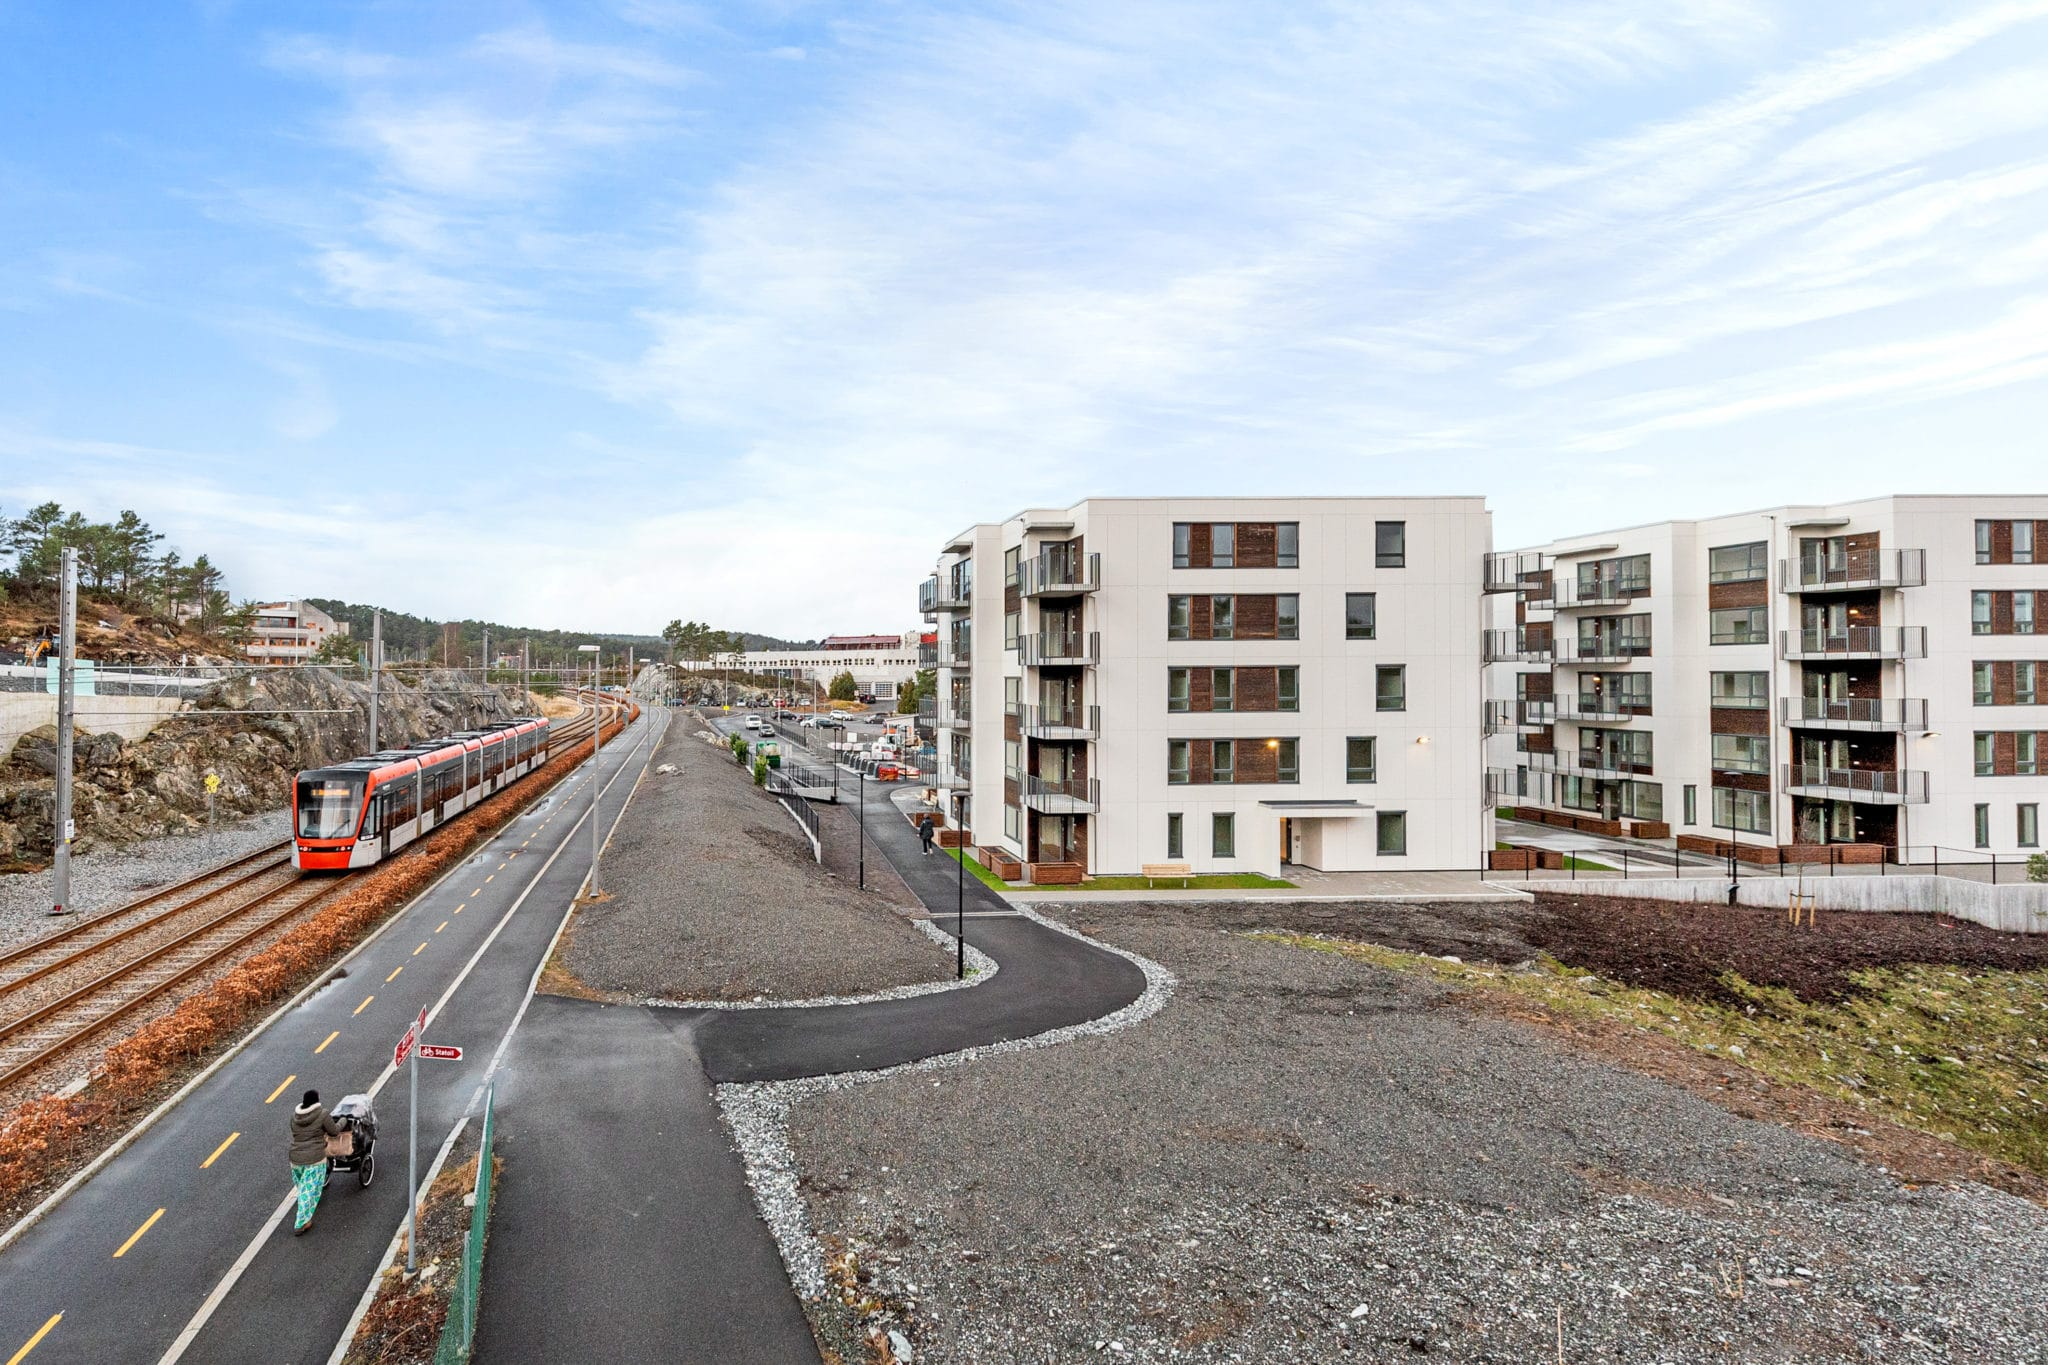 Hvite bygninger med vei og bybane tog foran